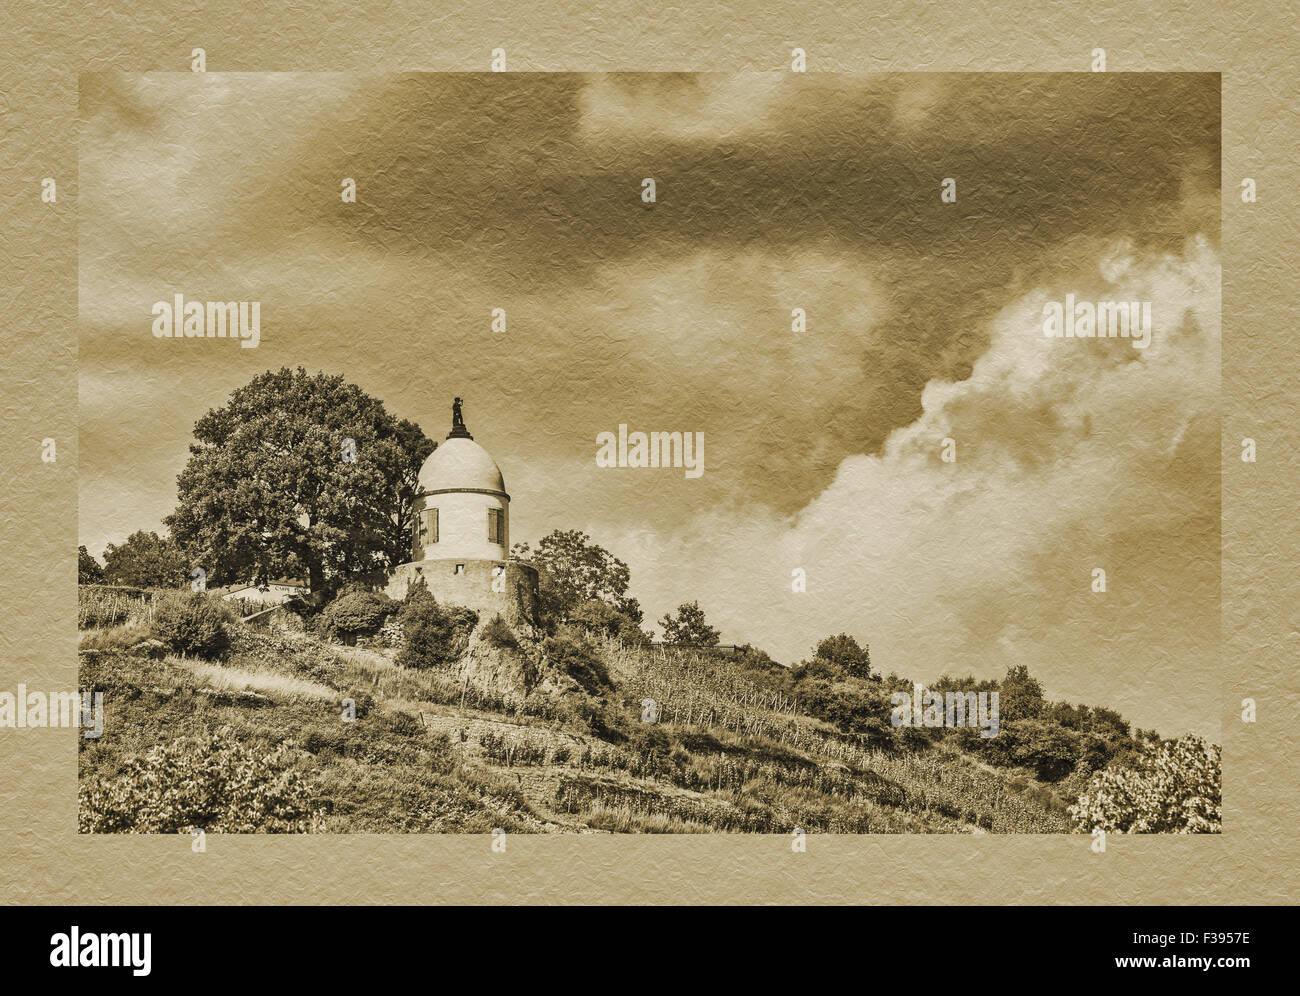 The Jacobstein is a vineyard gazebo in Radebeul above Castle Wackerbarth, Radebeul near Dresden, Saxony, Germany, Stock Photo